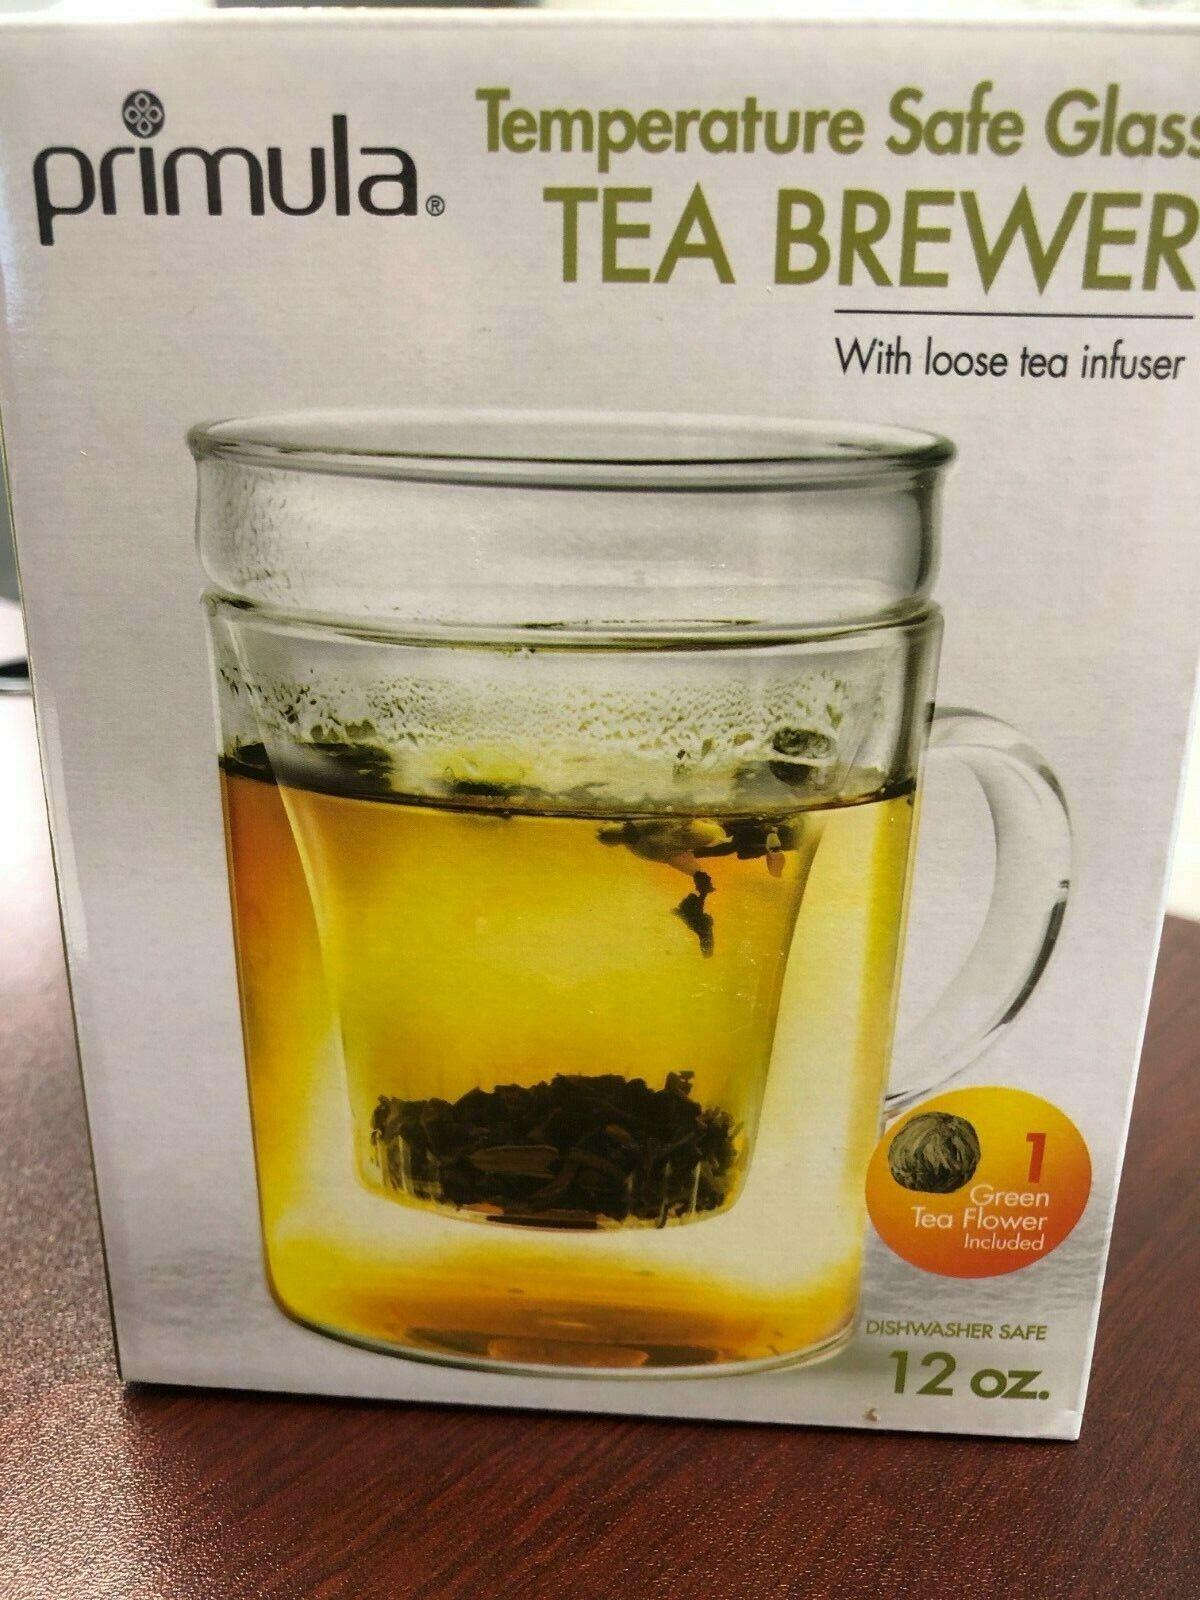 Primula Glass Mug with Loose Tea Infuser Brewer, 12 Oz w Tea